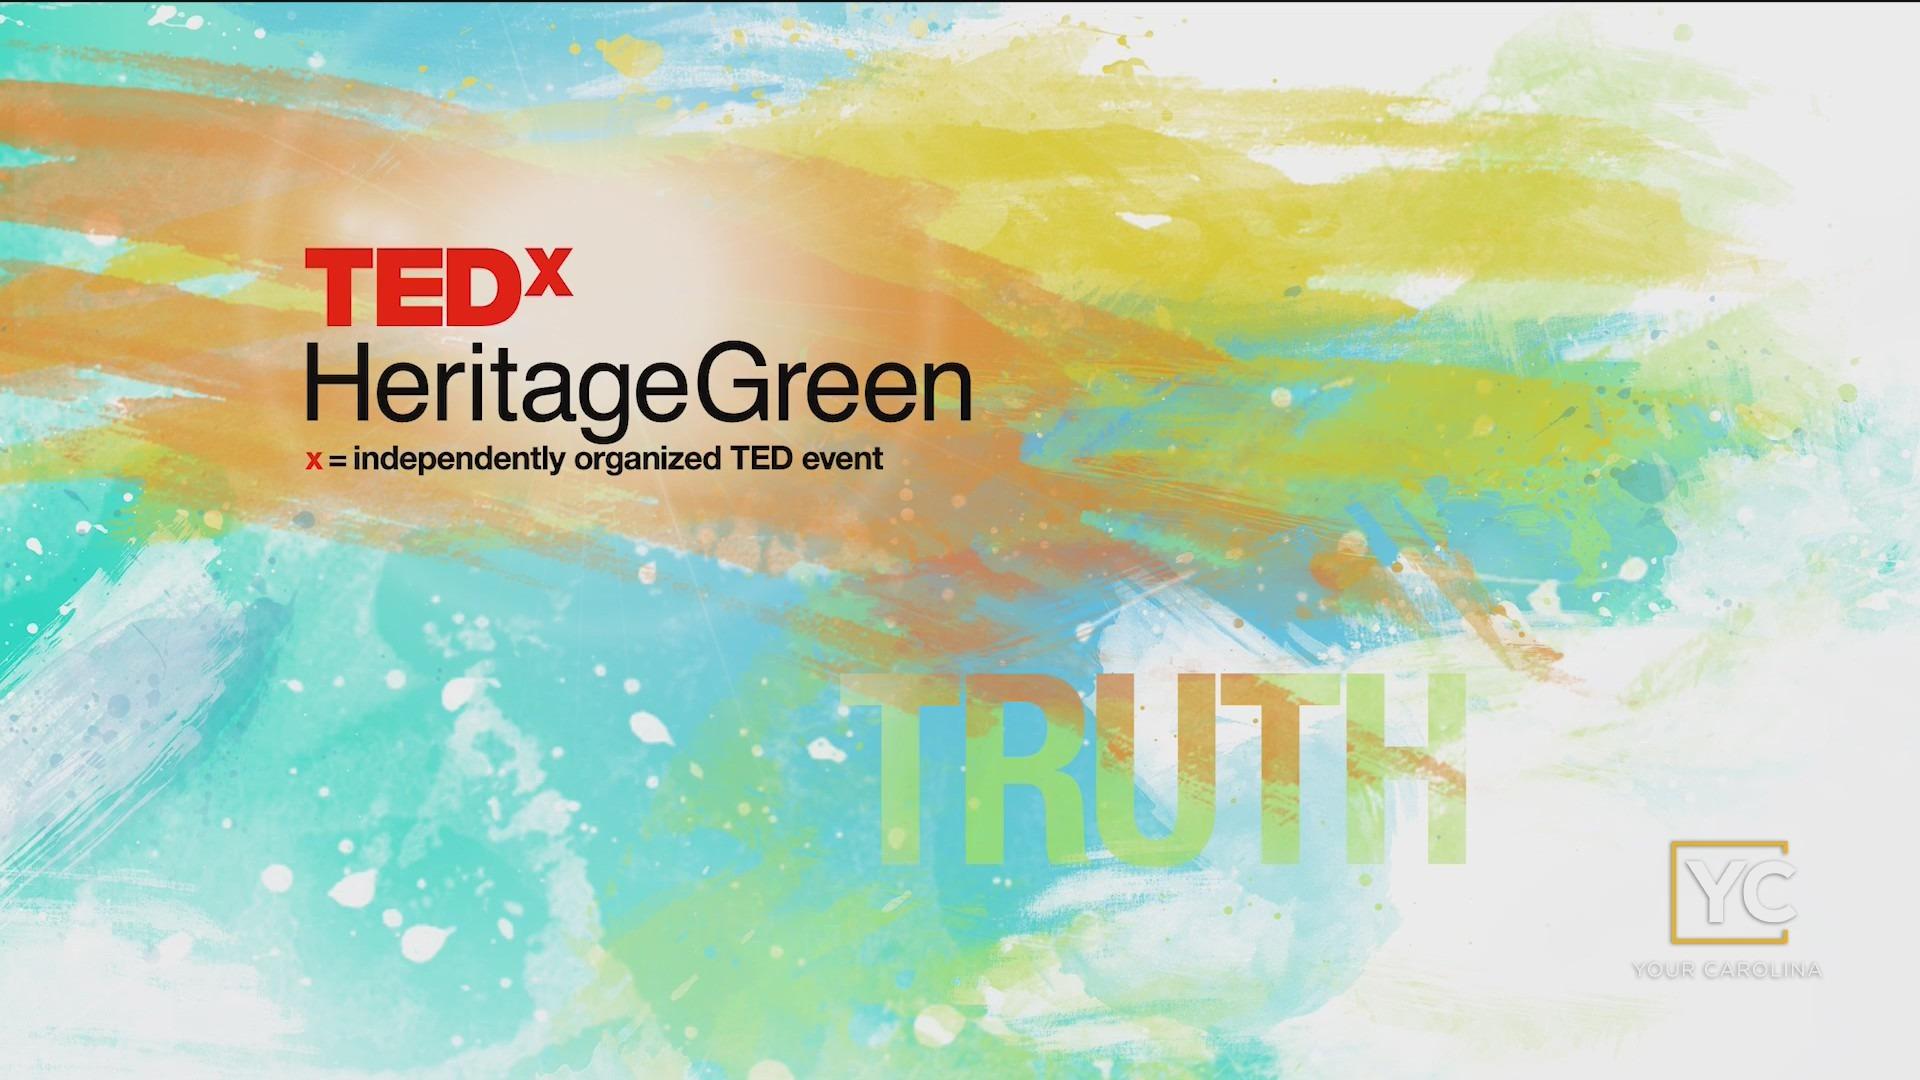 TEDx Heritage Green